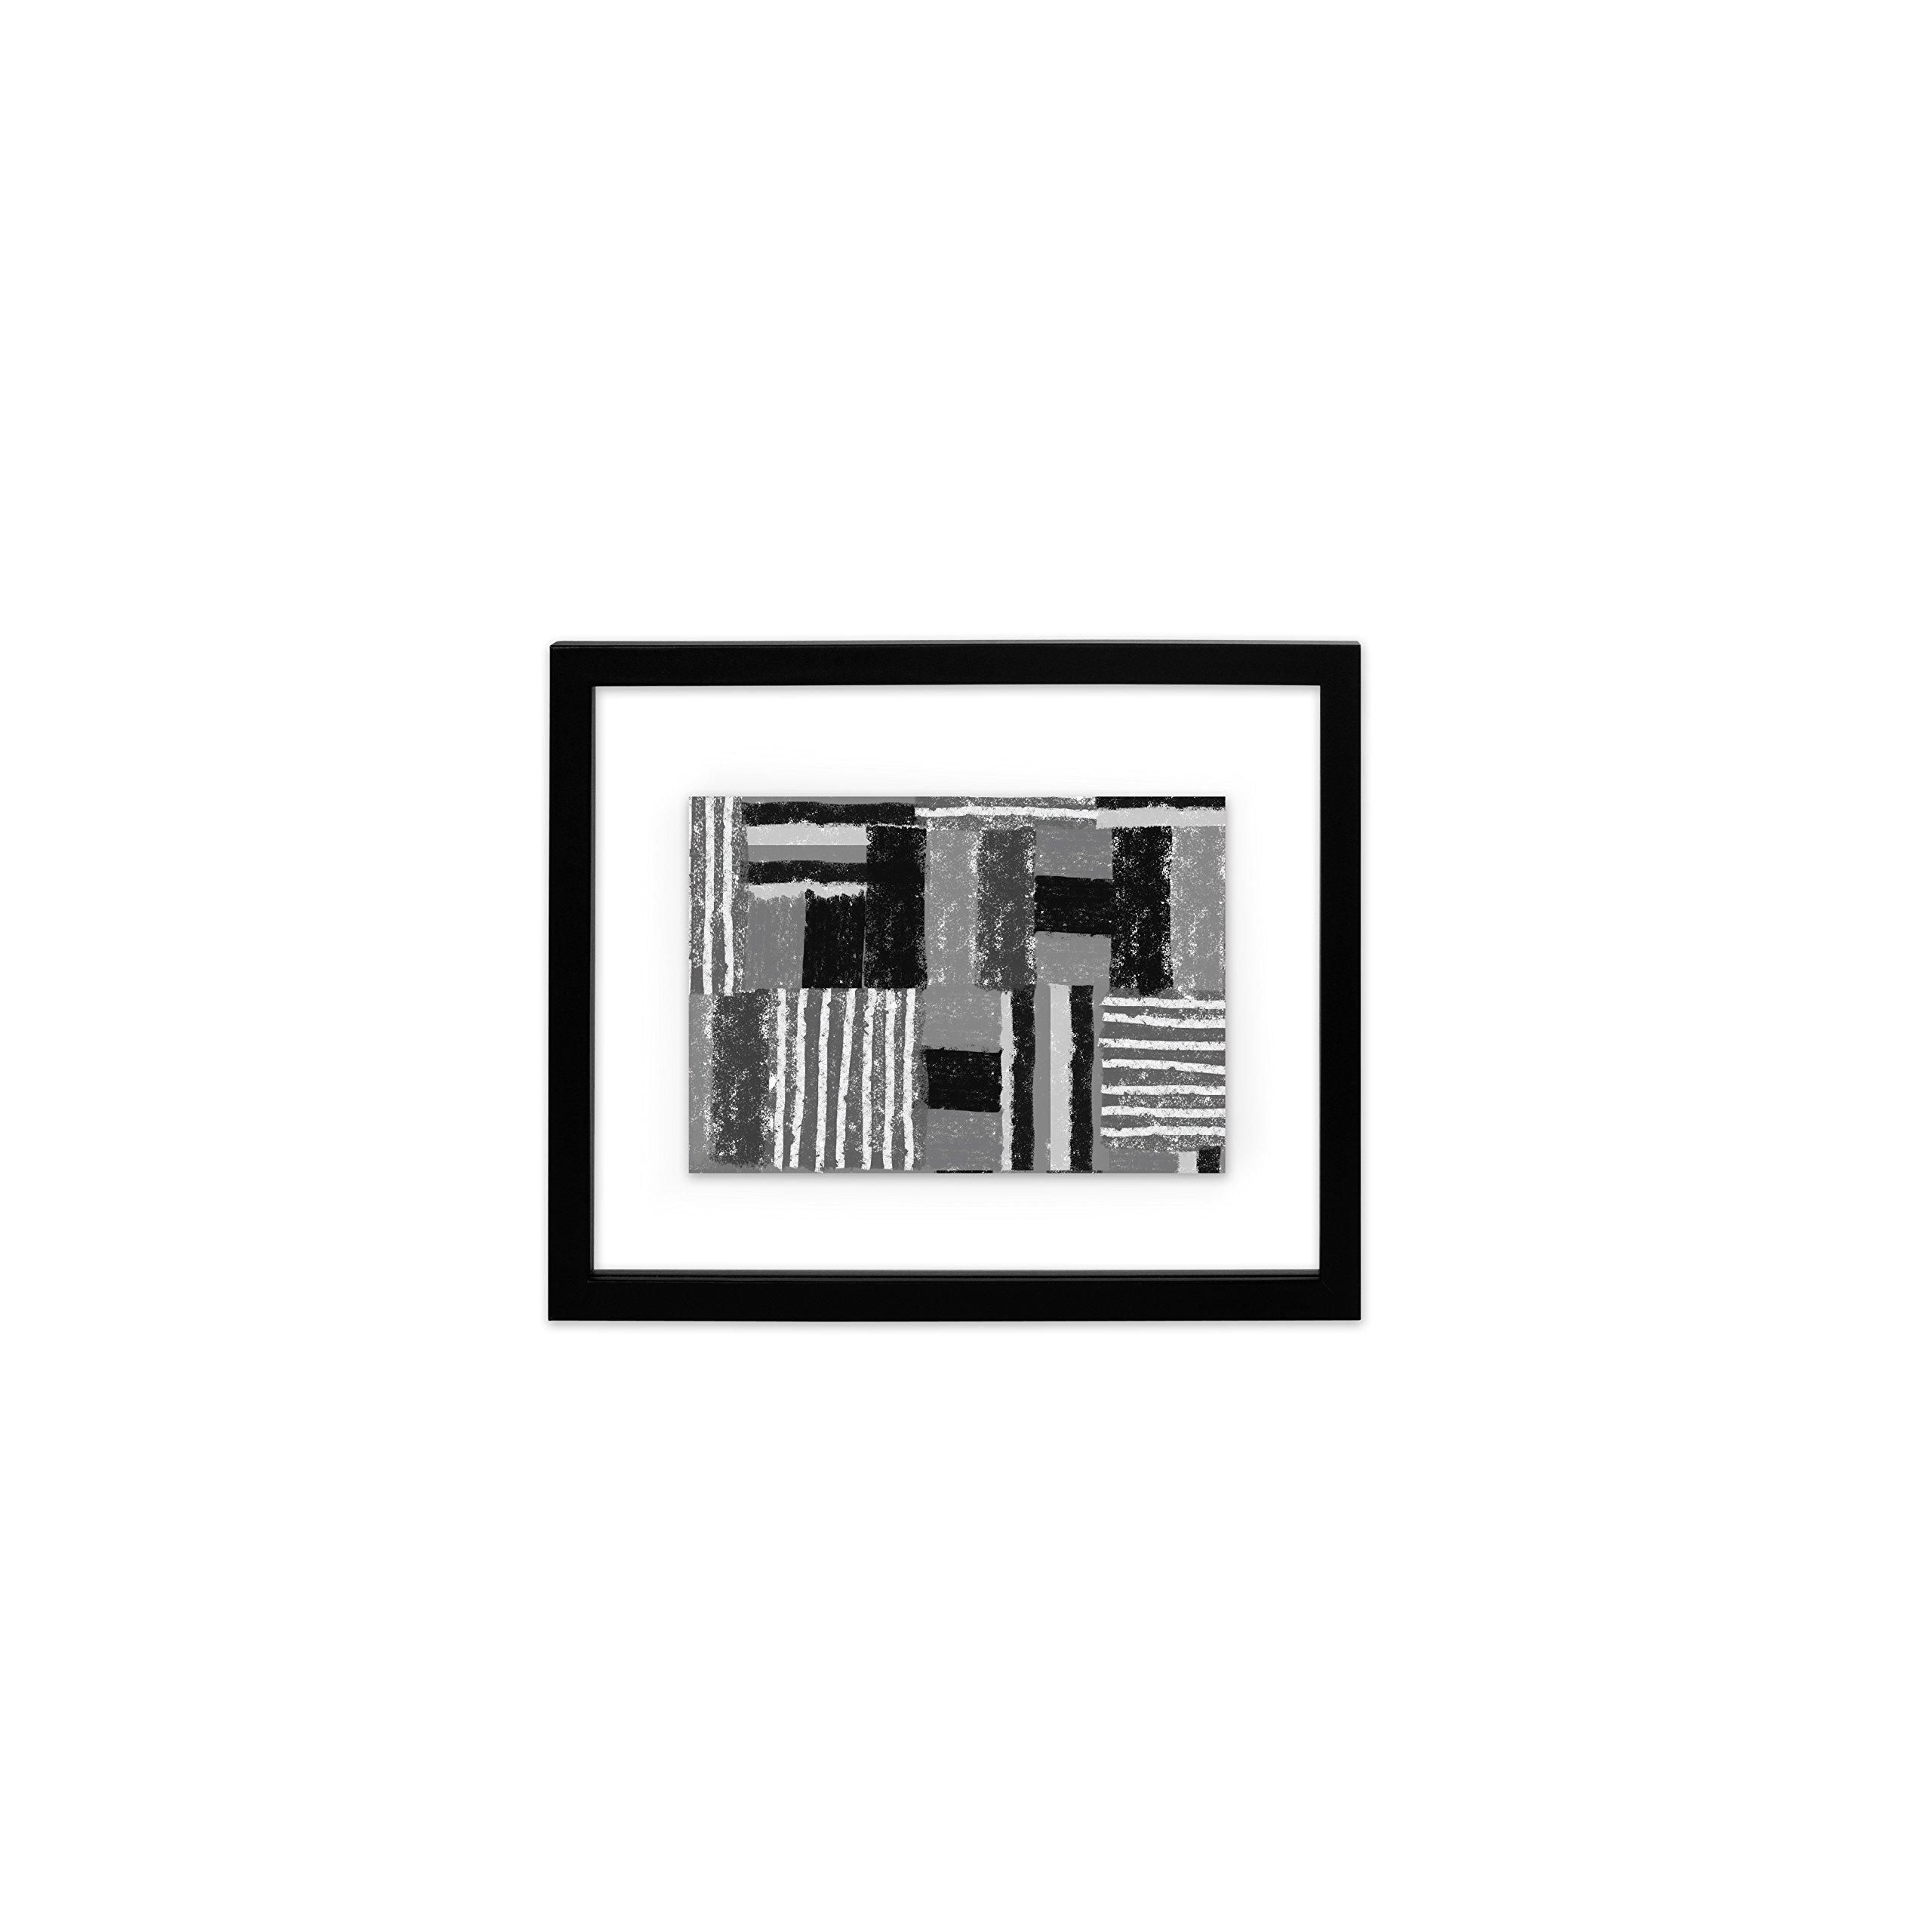 EDGEWOOD Driftwood- Float Frame- 5x7 Black